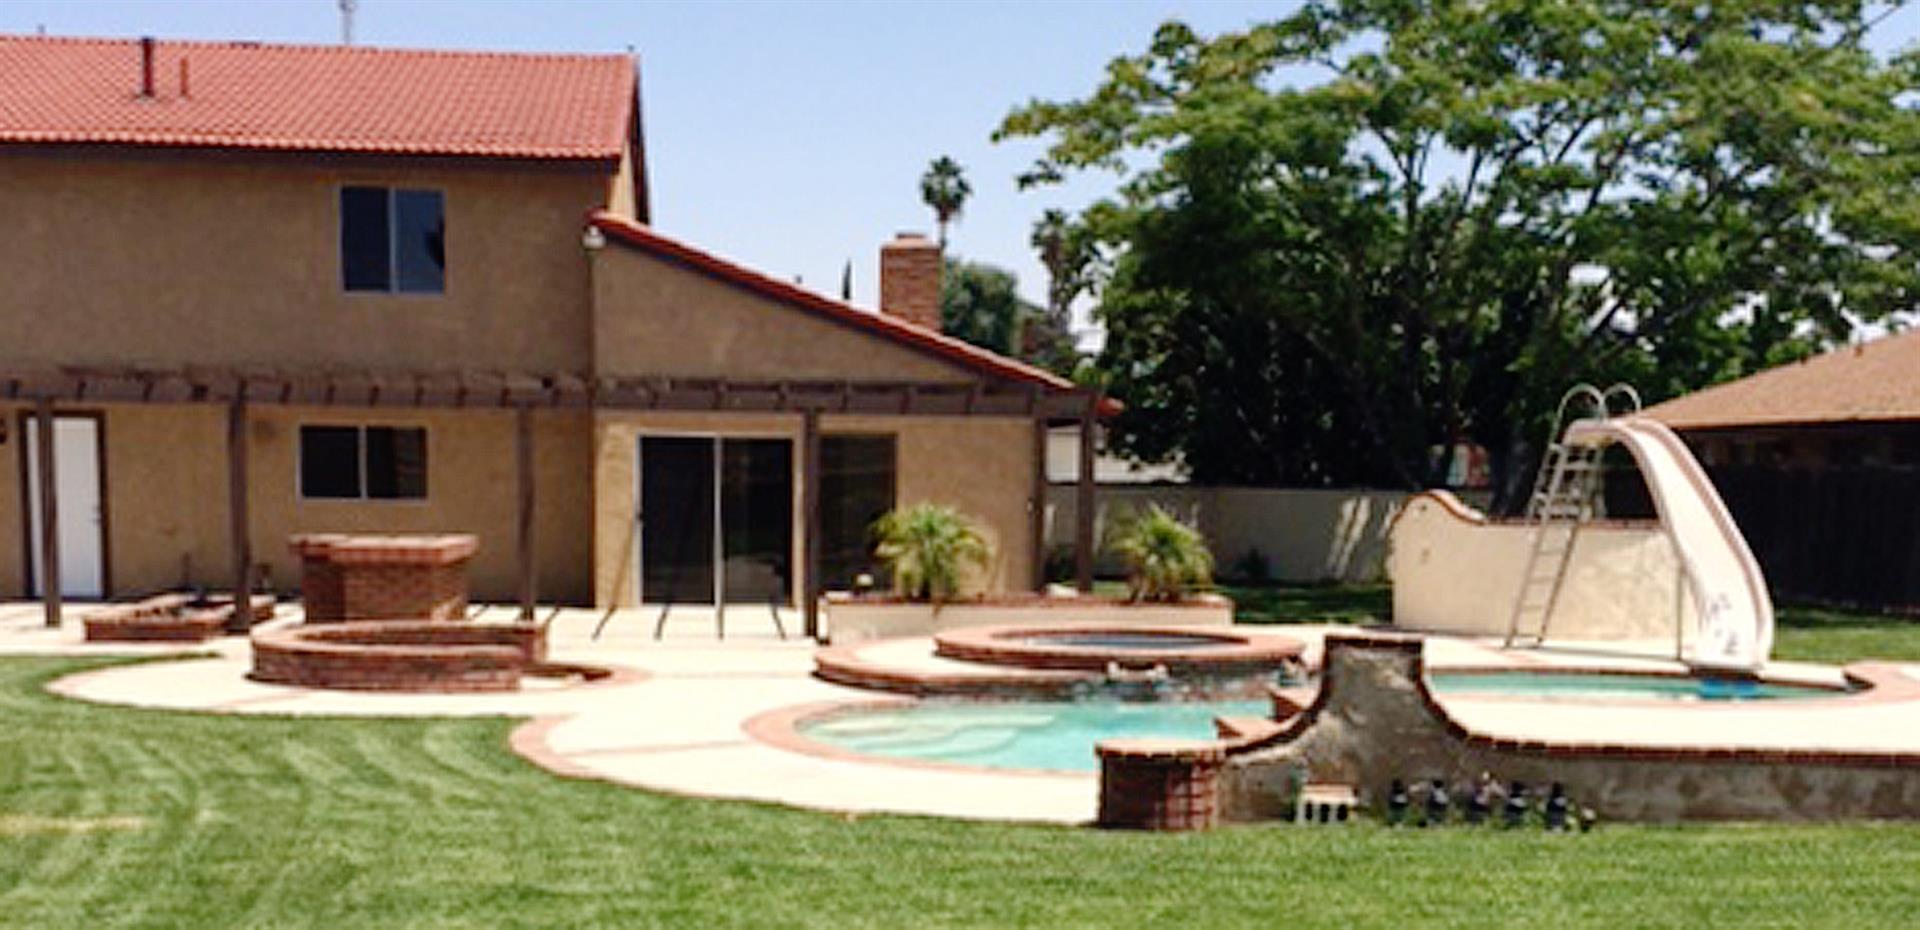 14131 Calle Vista Dr, Riverside, CA 92508